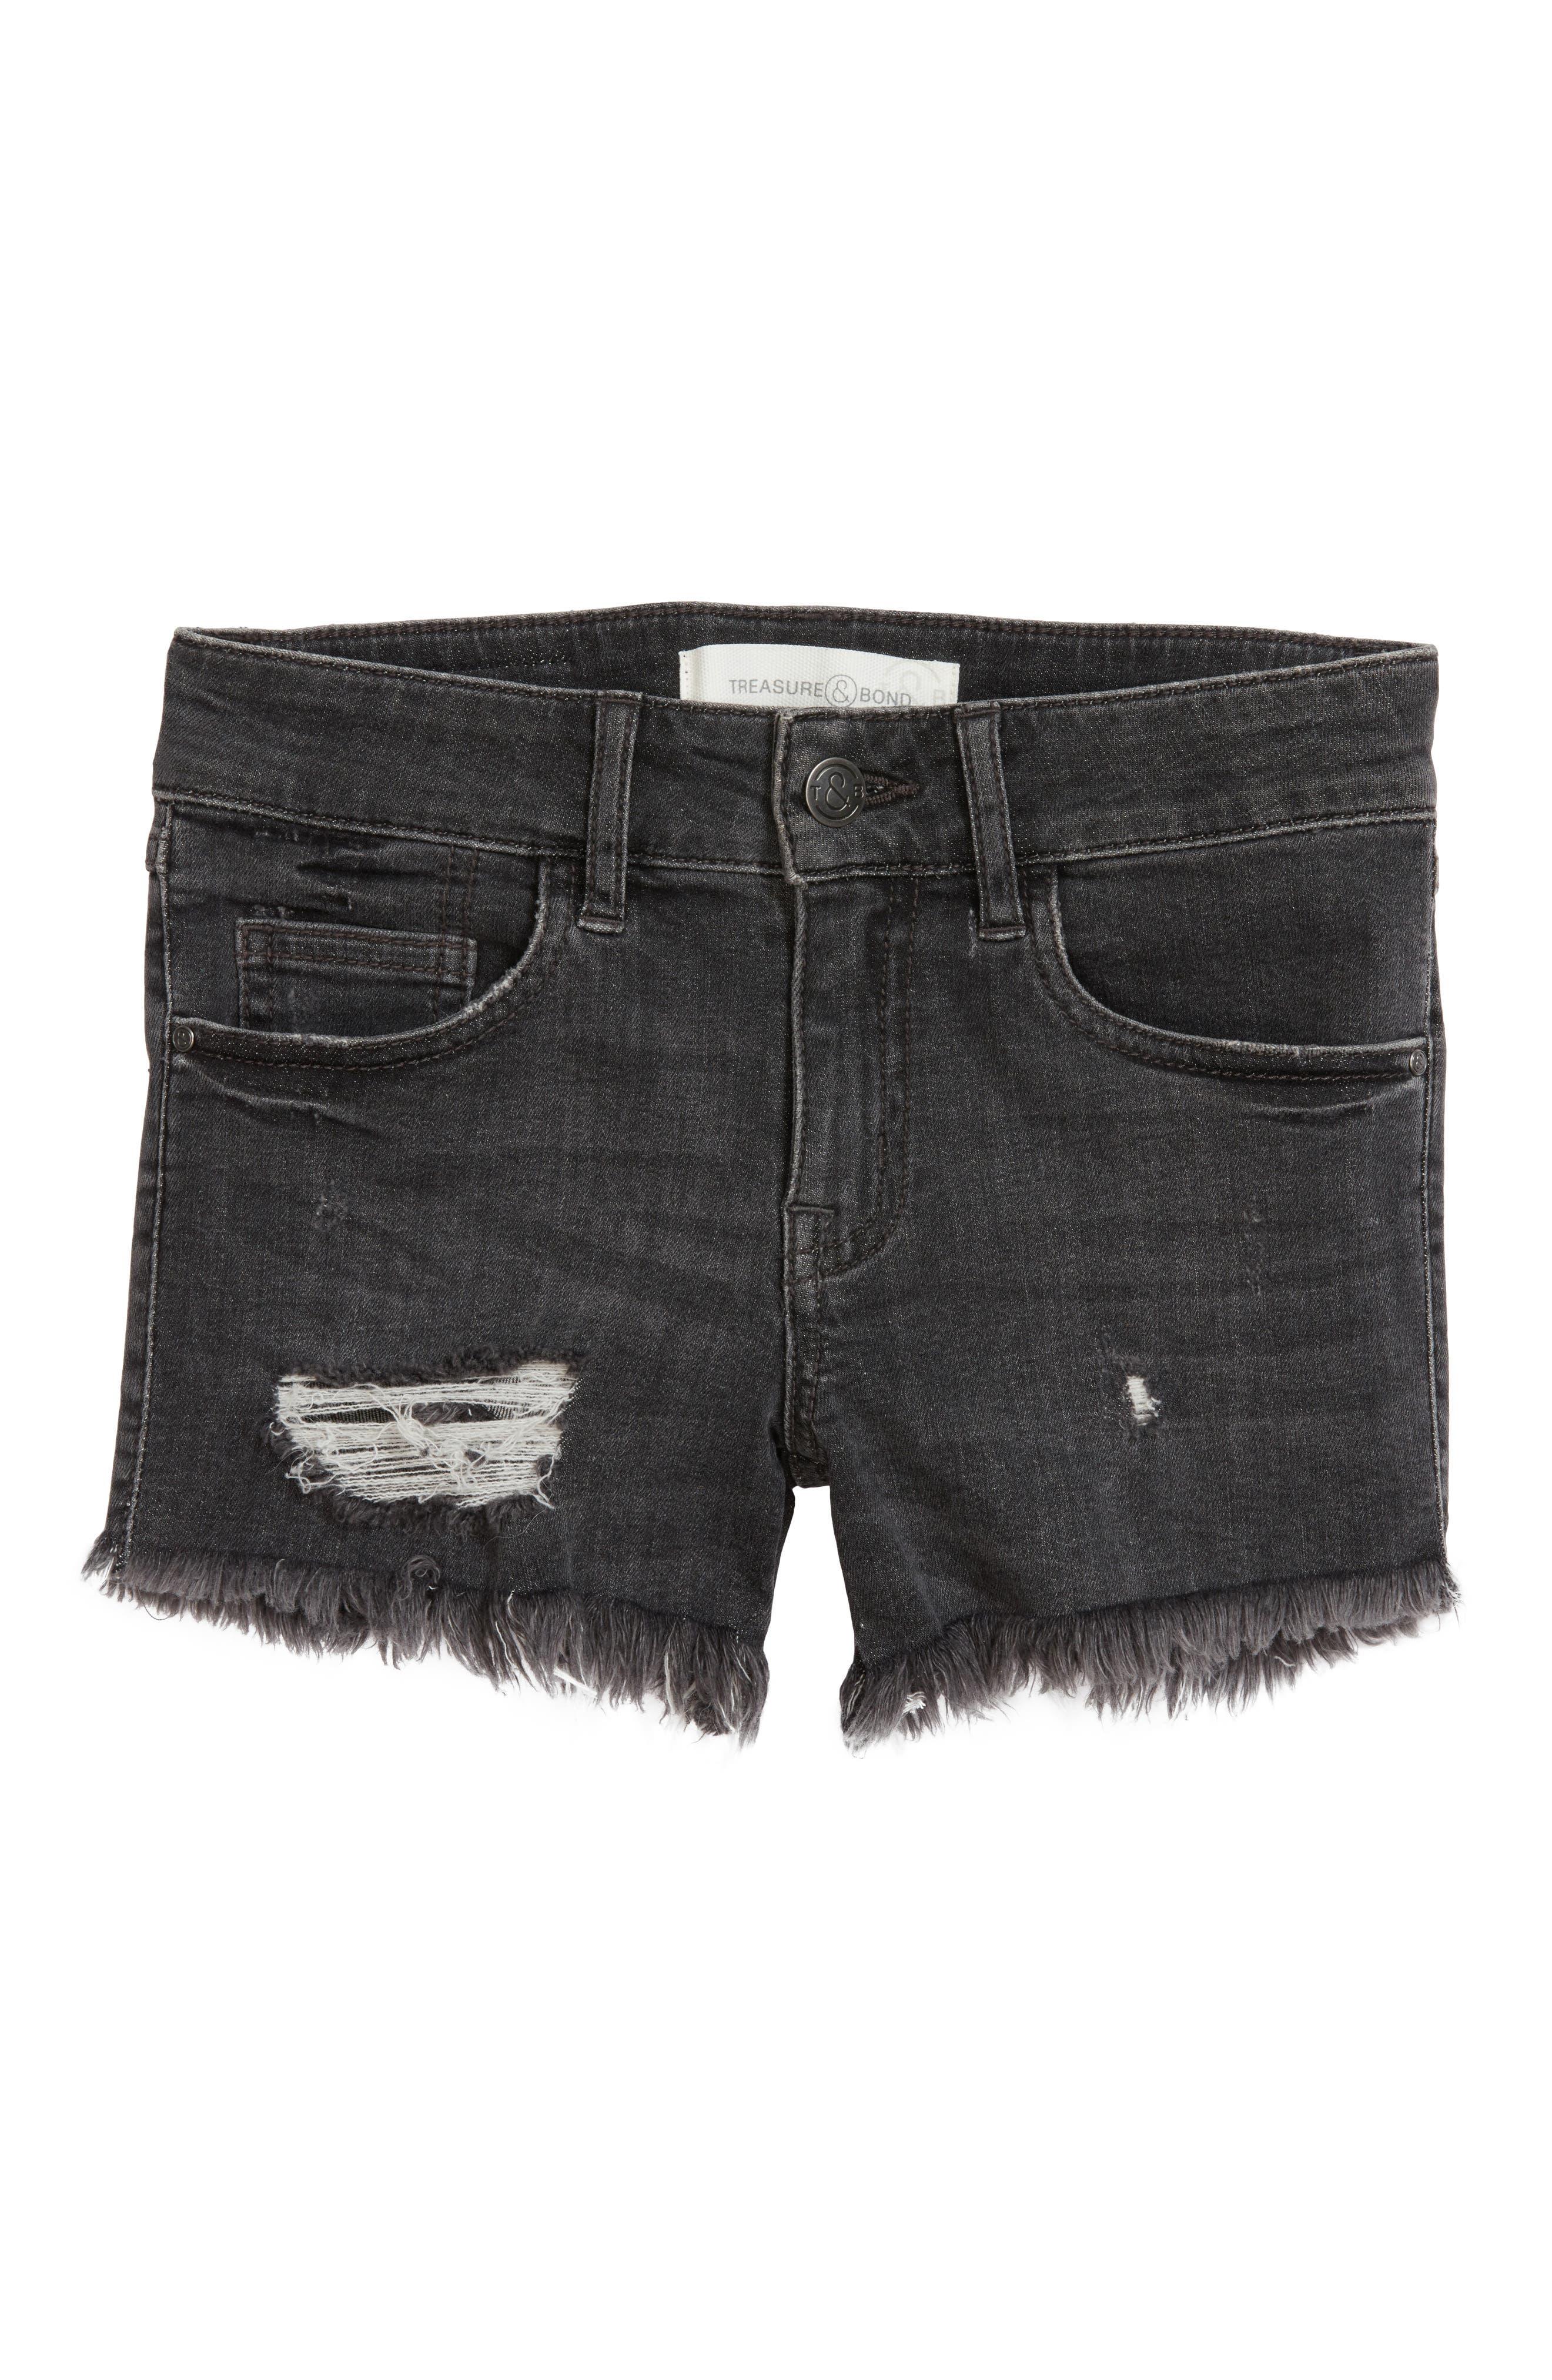 Distressed Cutoff Denim Shorts,                             Main thumbnail 1, color,                             Black Vintage Wash